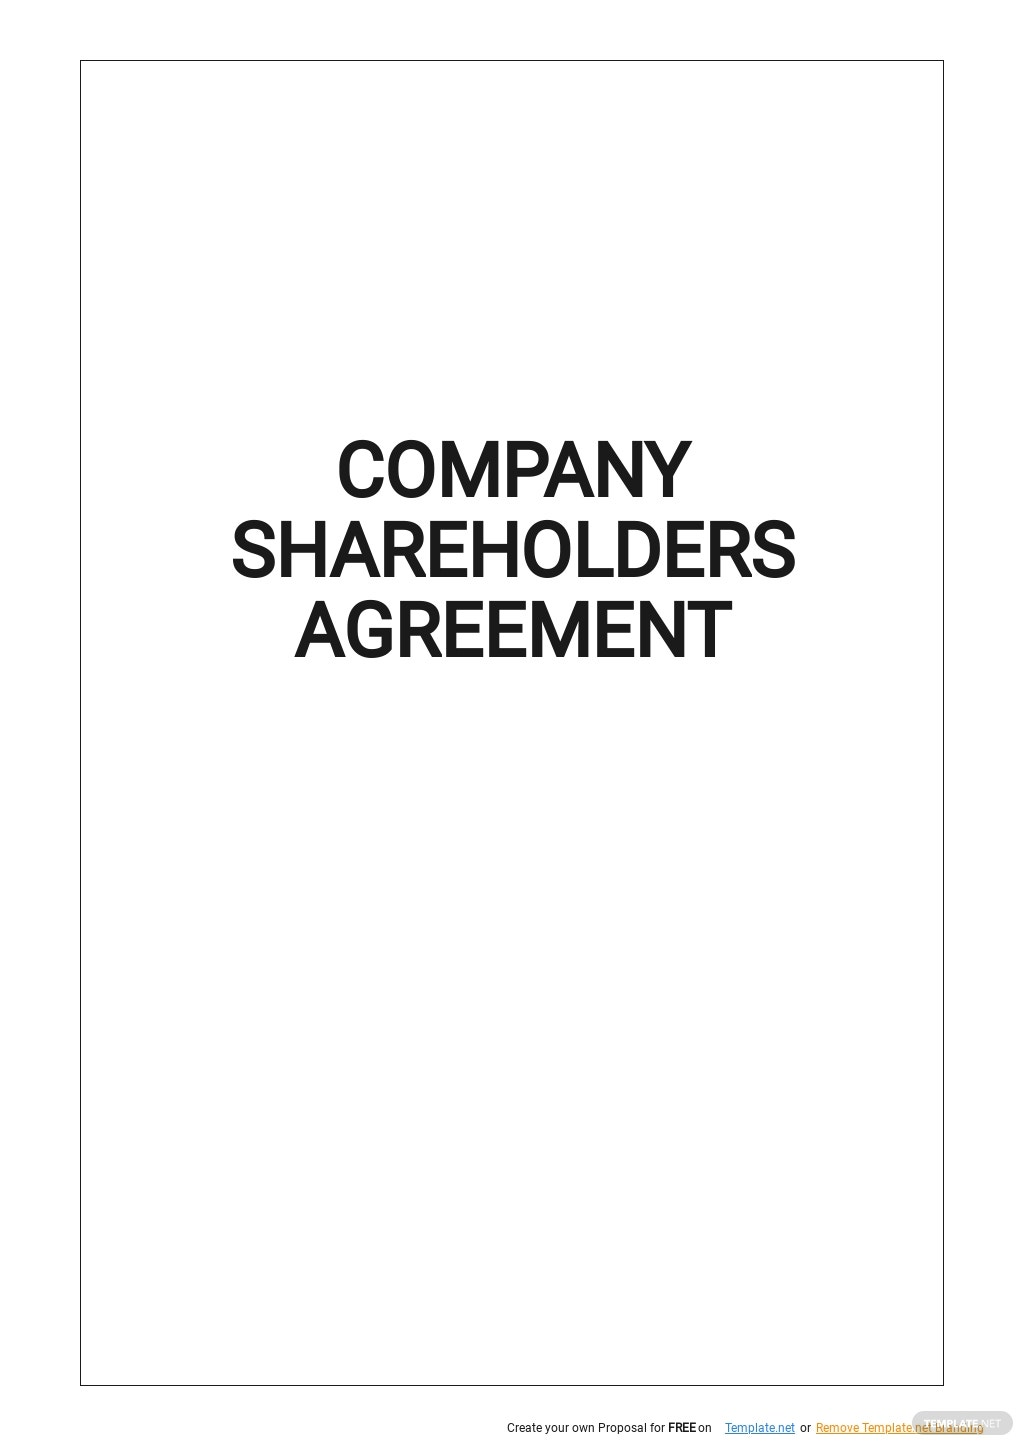 Company Shareholders Agreement Template.jpe